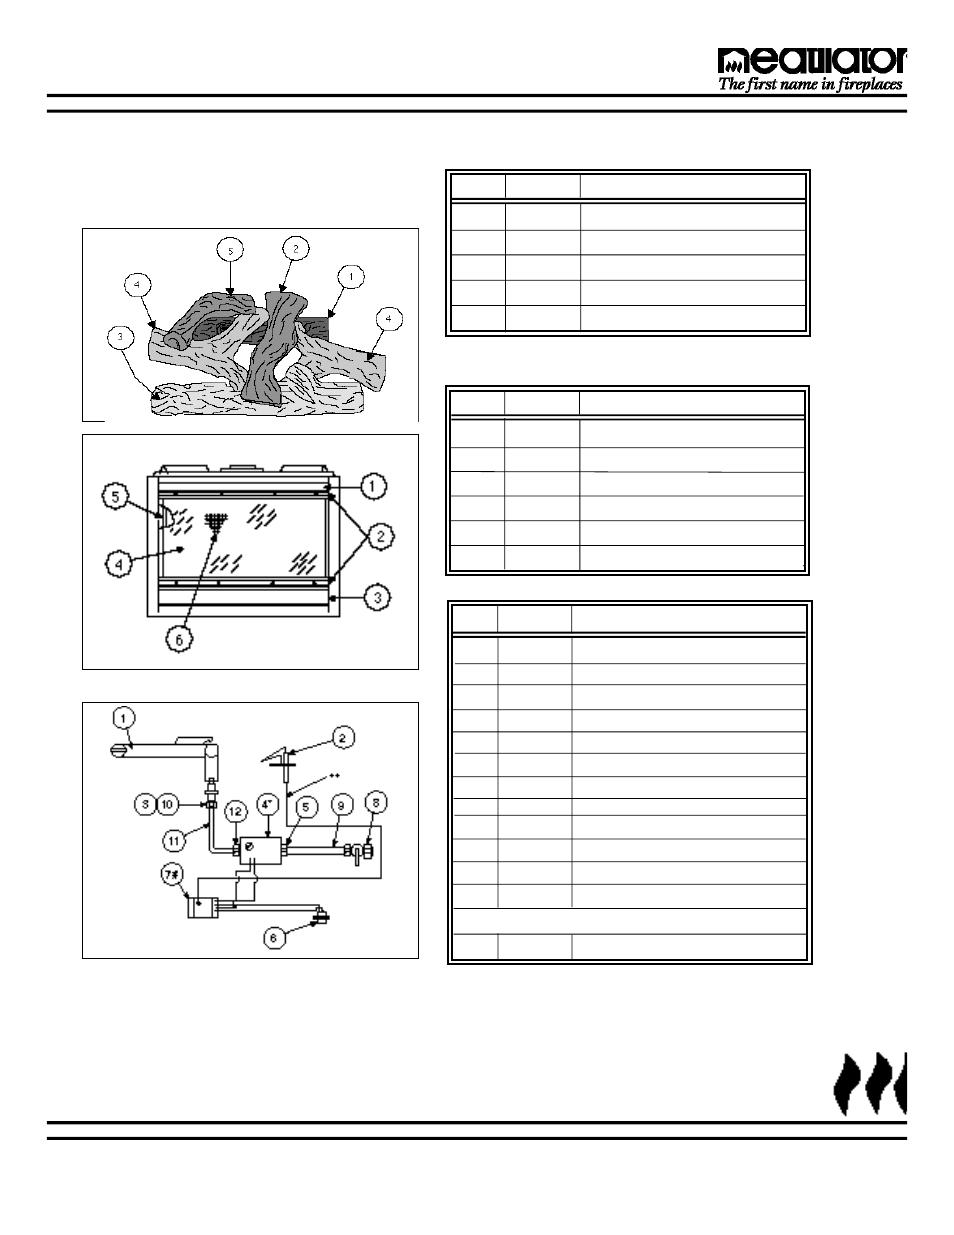 hight resolution of ix replacement parts heatiator heatilator fireplace gc150 user manual page 27 28